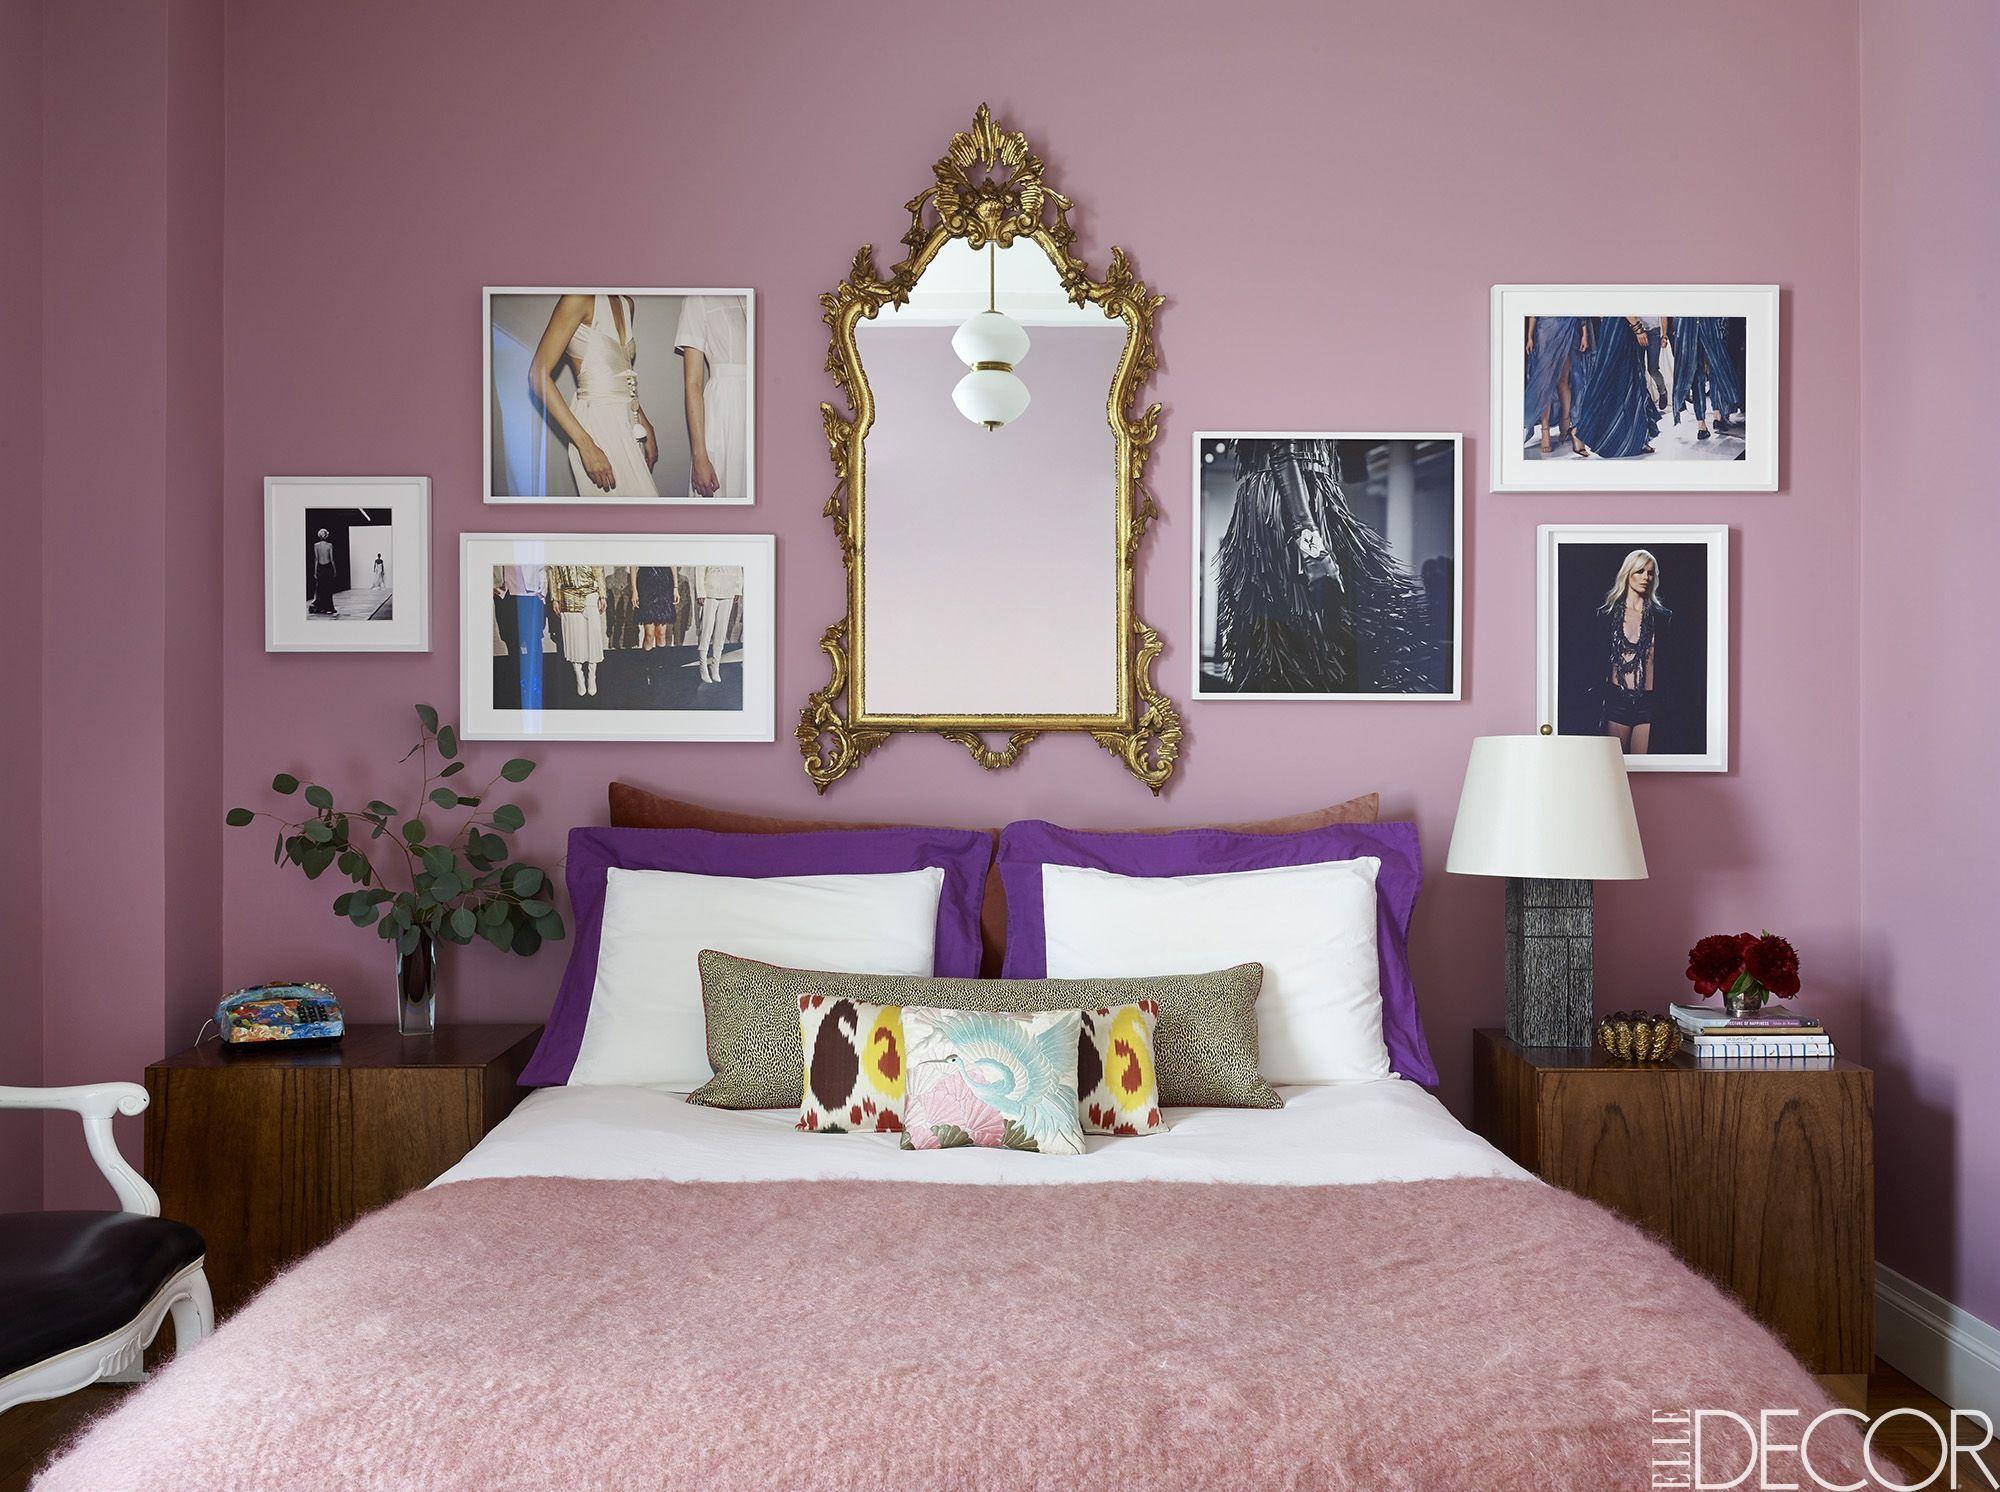 21 Best Purple Rooms Walls Ideas For Decorating With Rh Elledecor Com